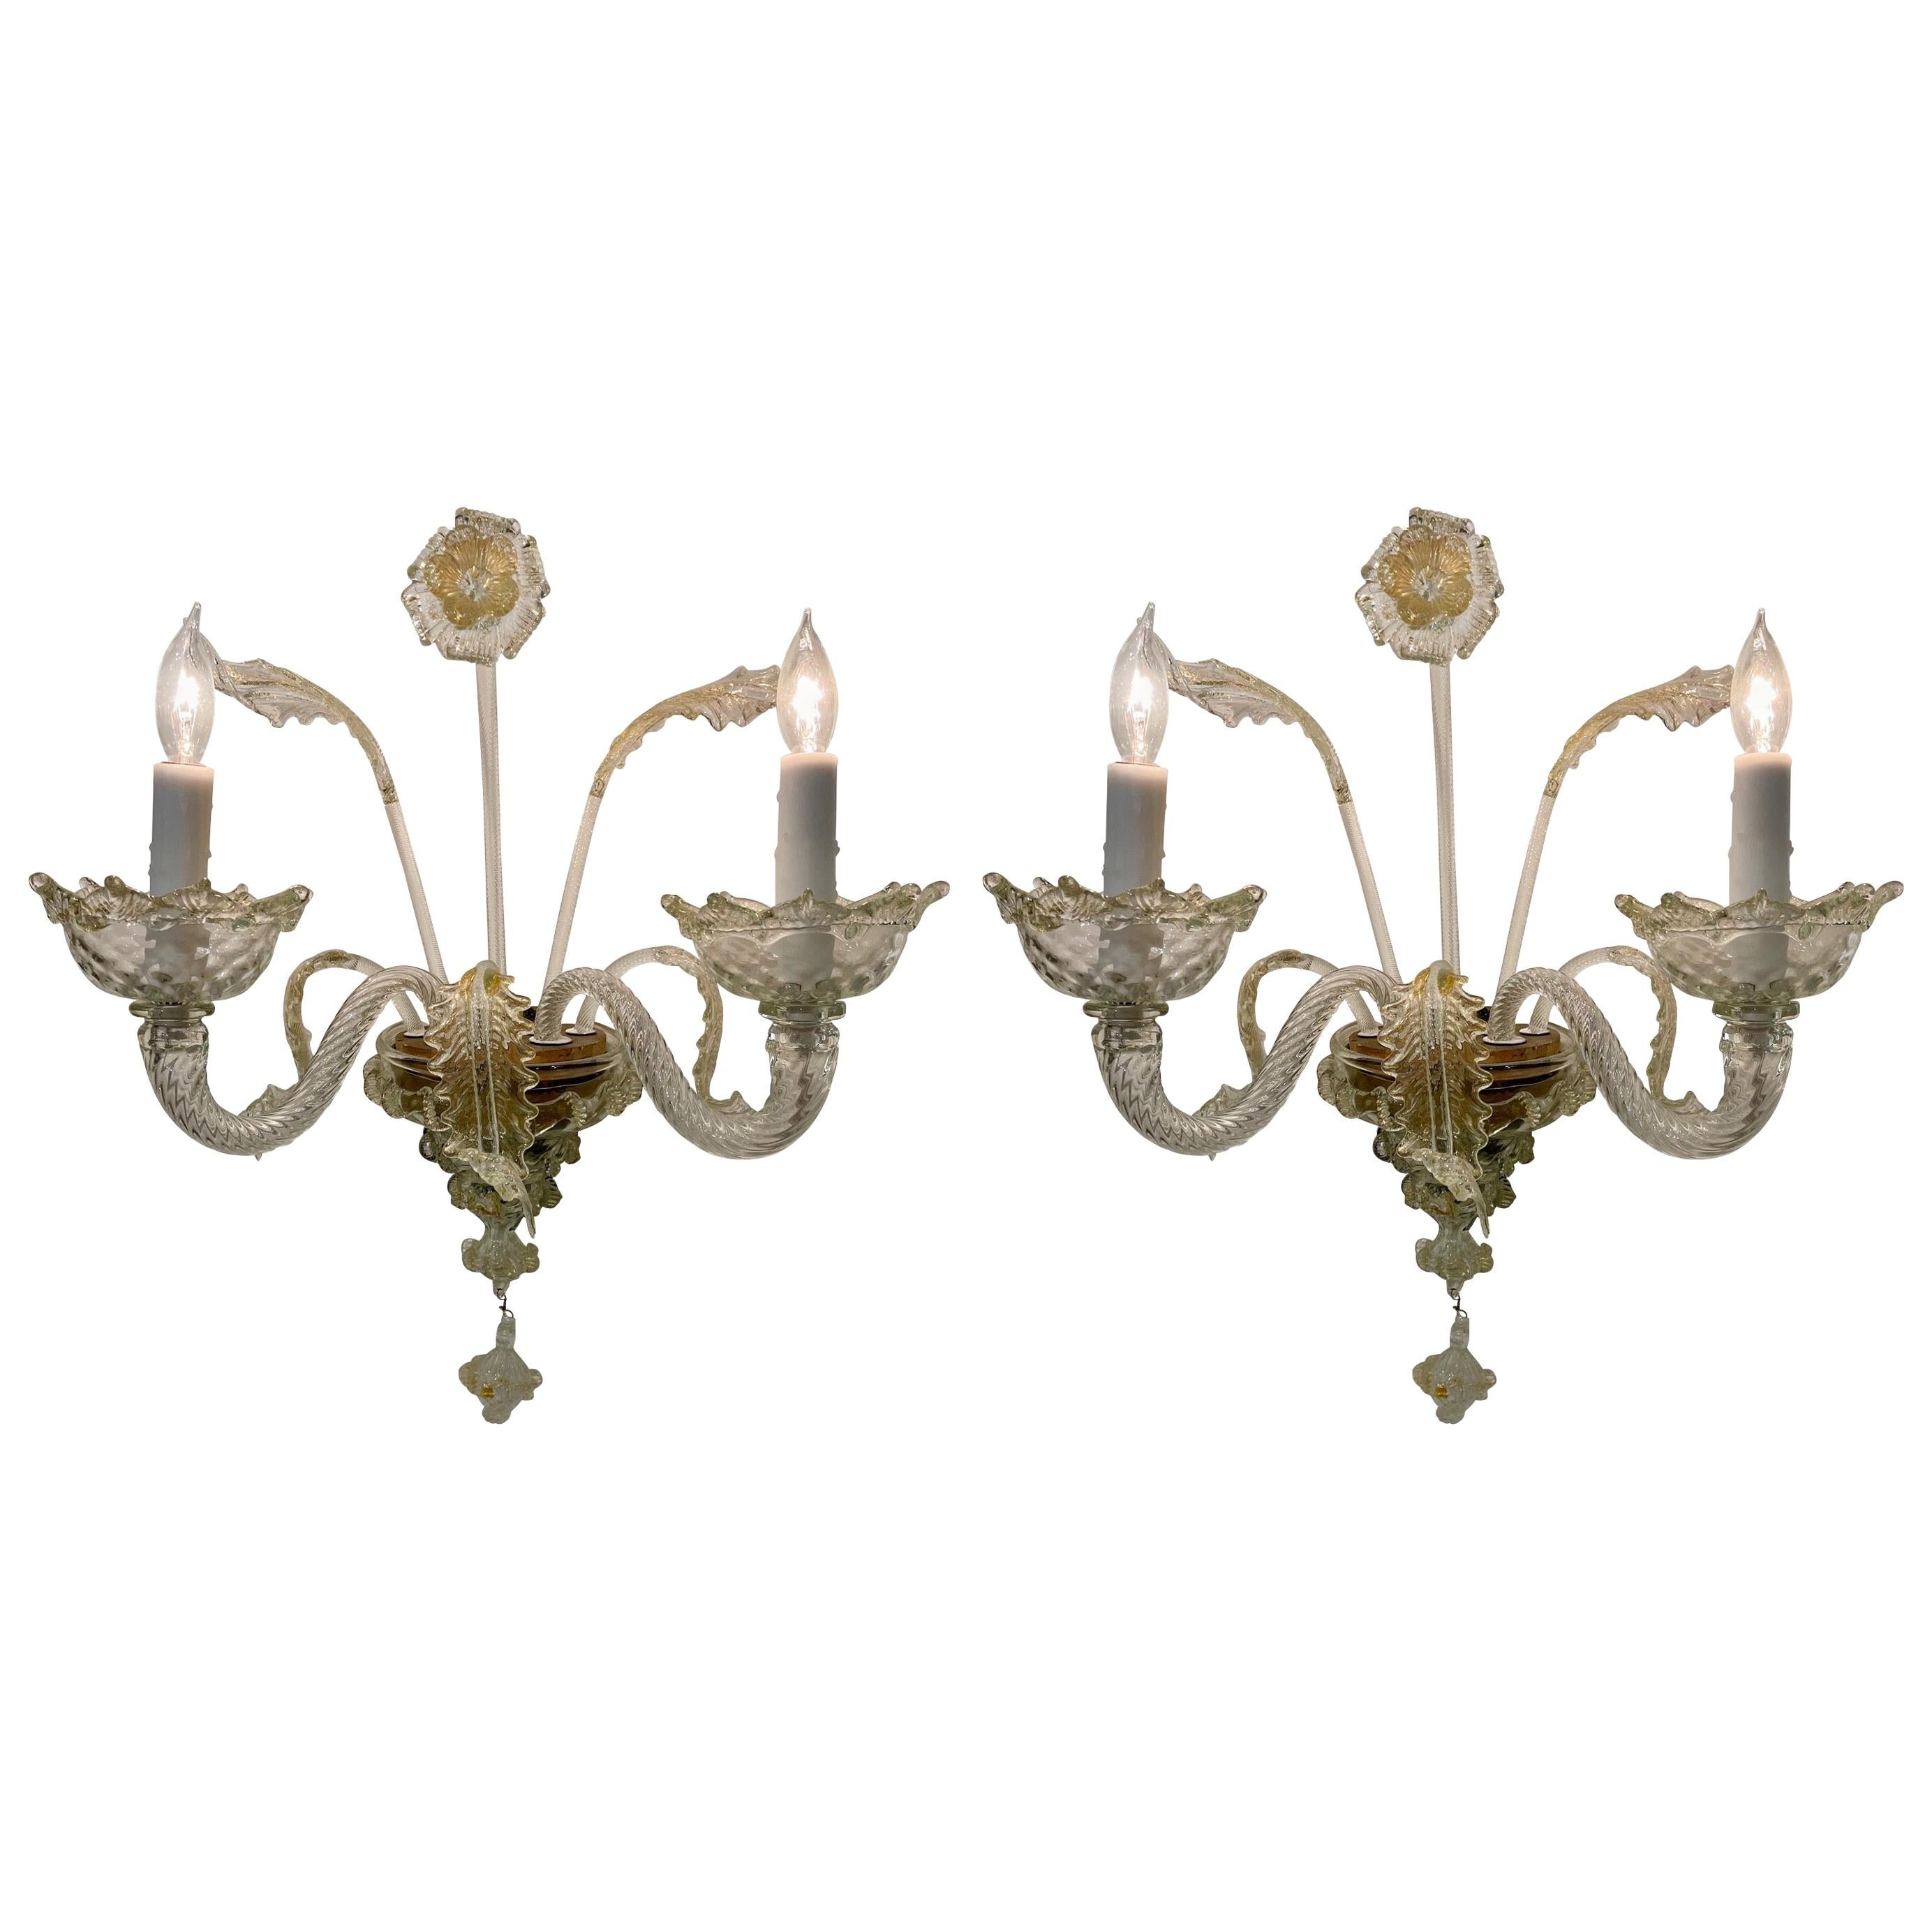 Pair of Vintage Italian Murano Glass 2-Light Sconces